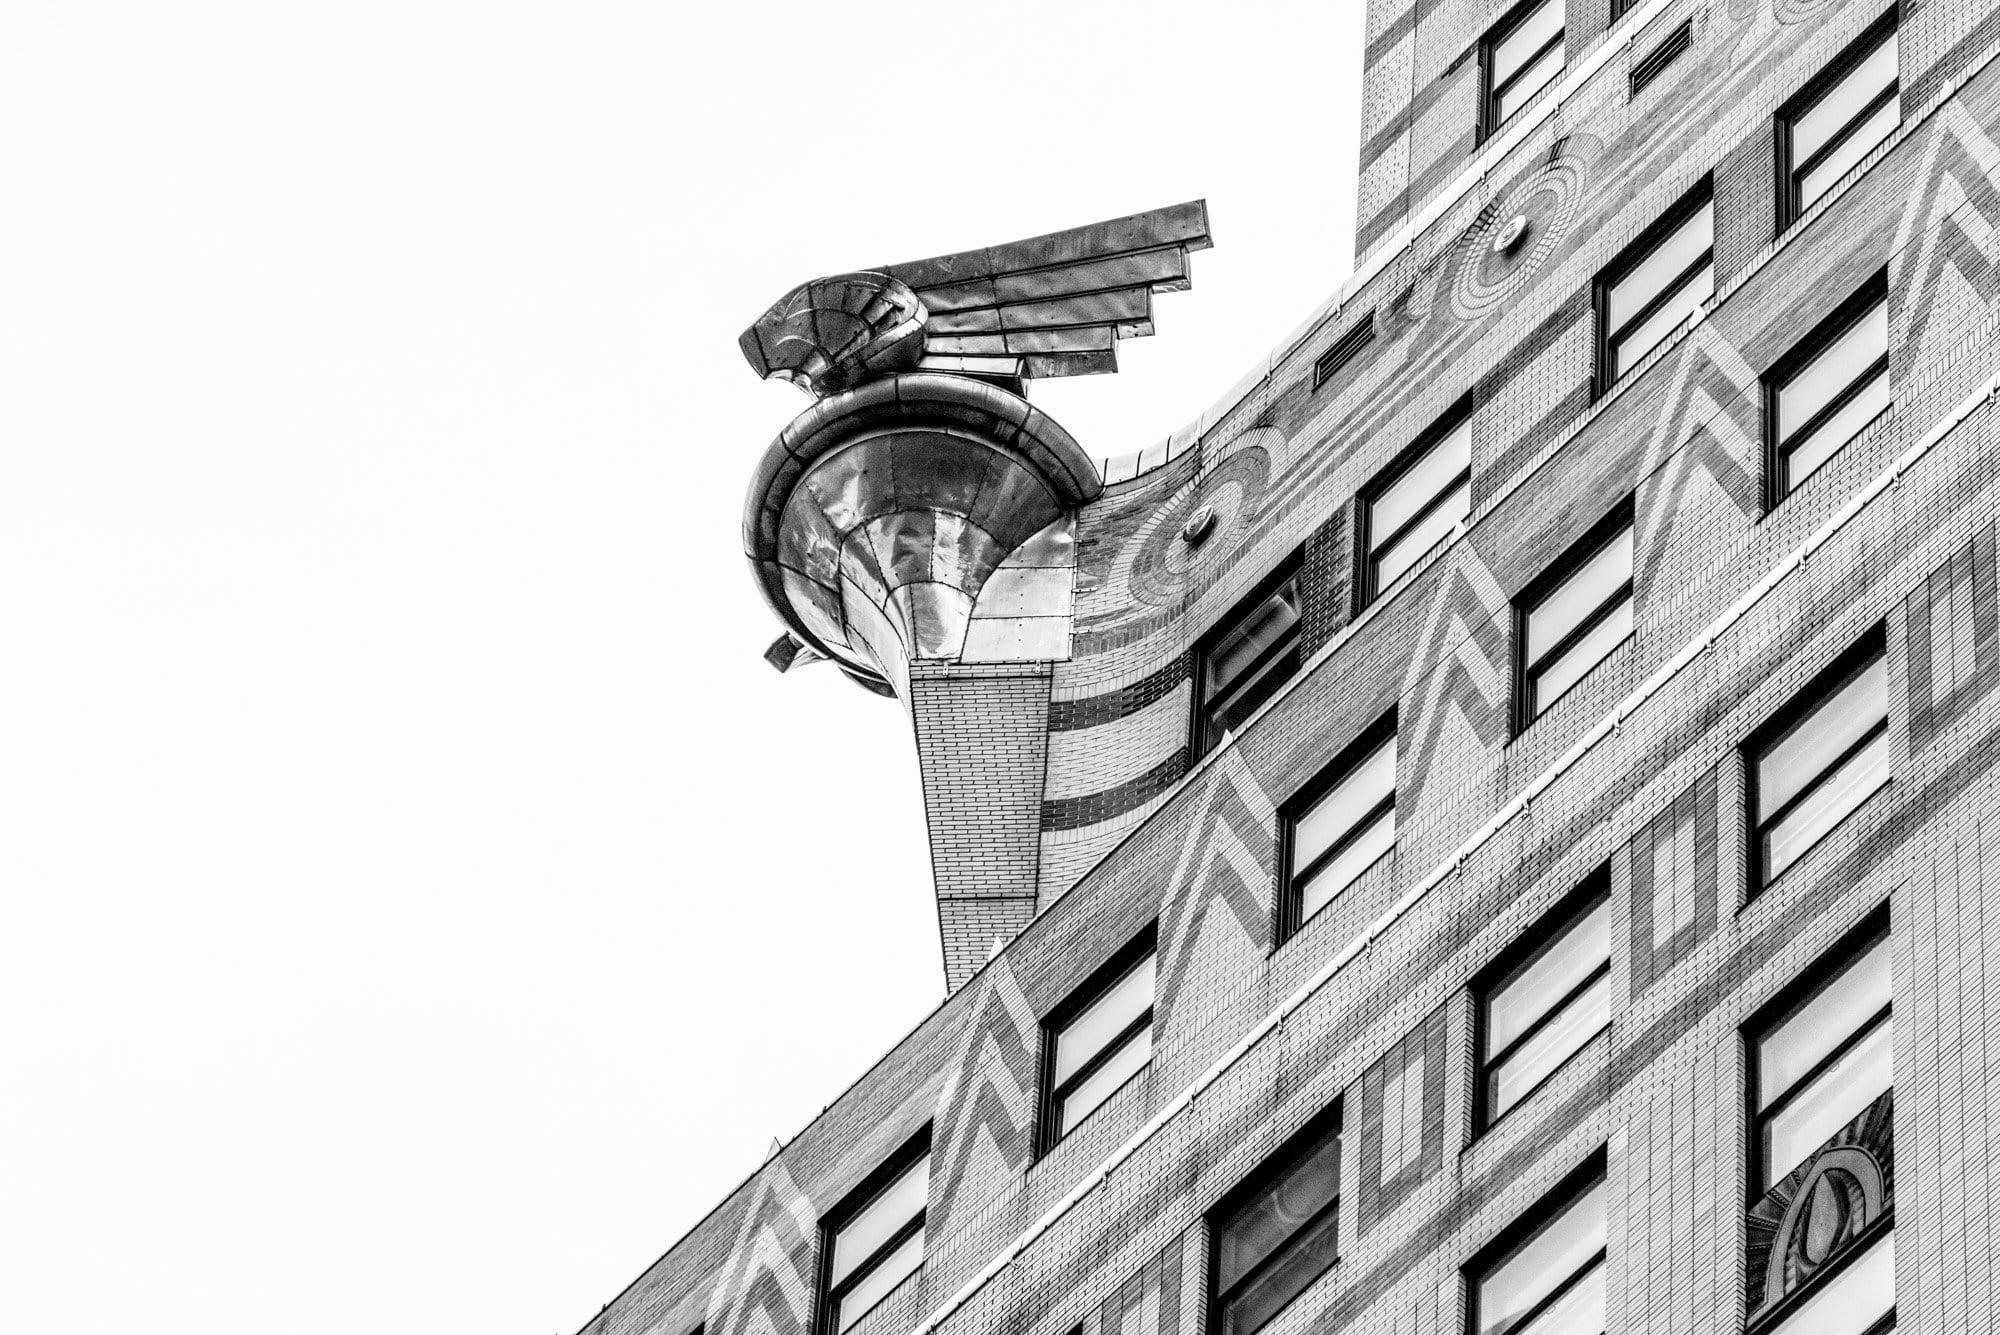 chrysler building, art deco